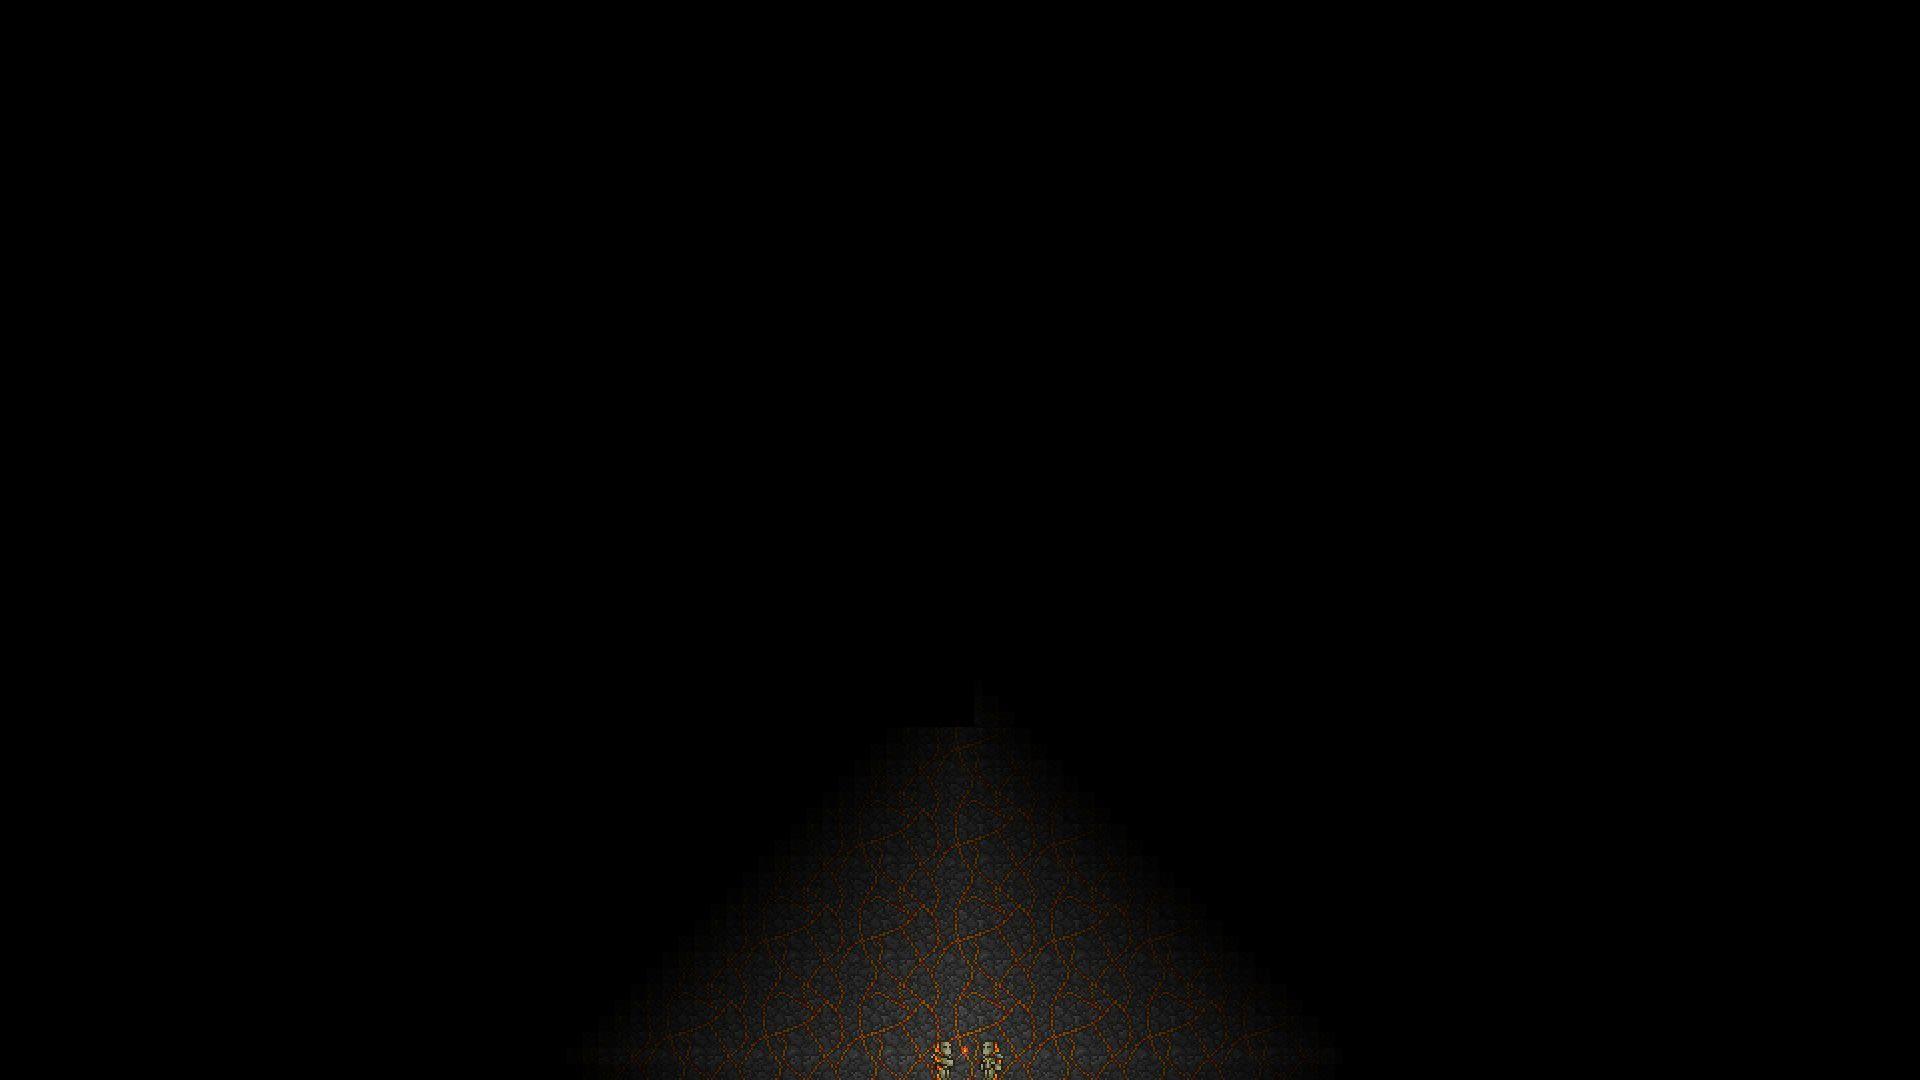 Minimalist Backgrounds 32 - 1920 x 1080